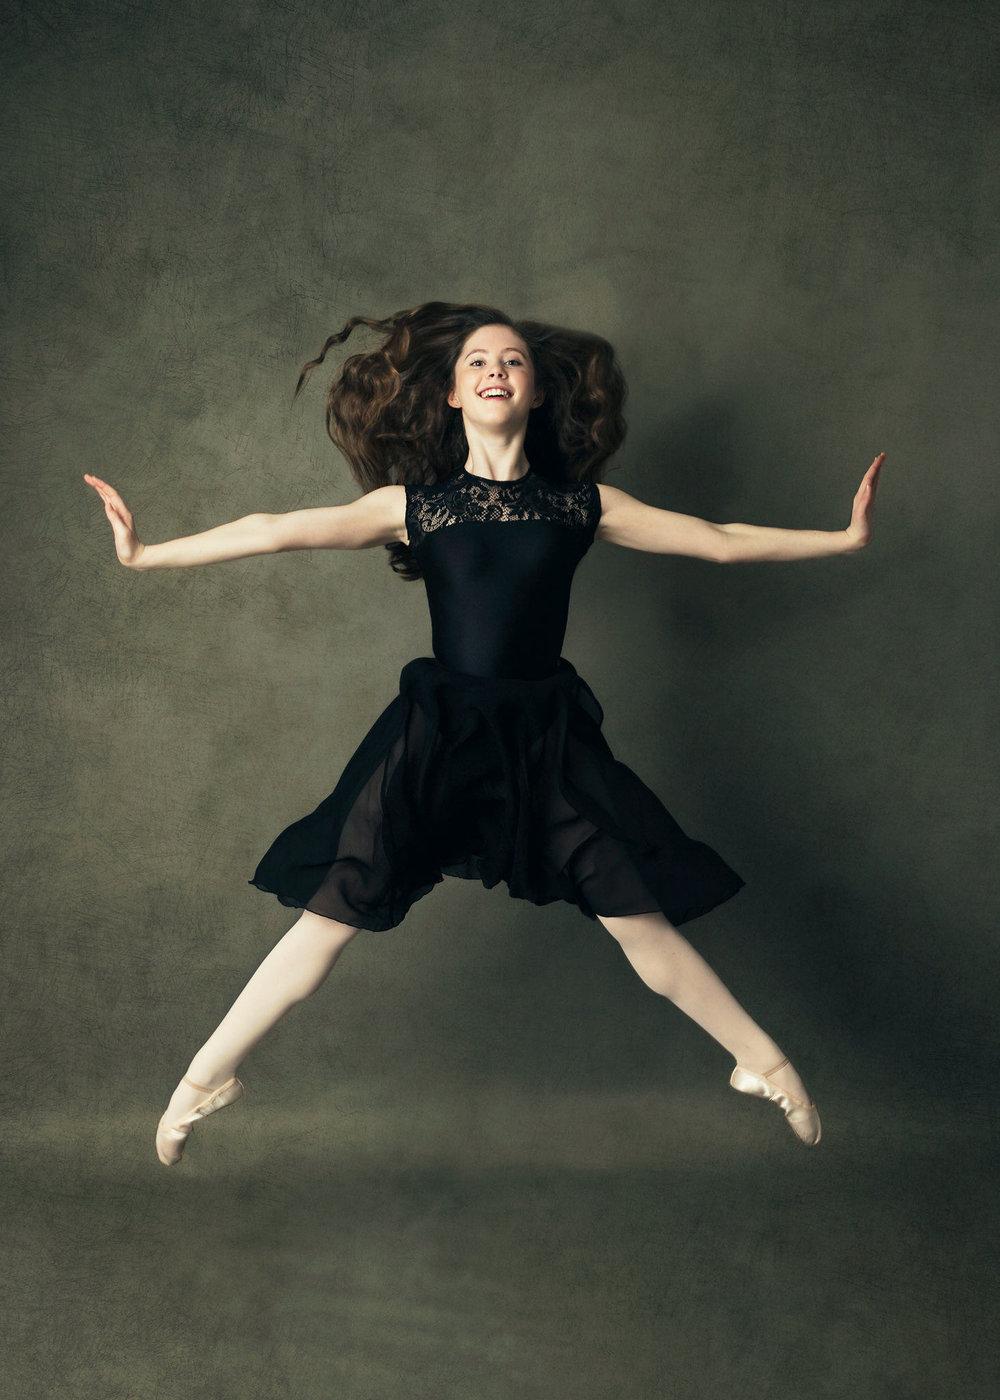 tara_morris_ballet_photography_uk_london_bath14-2.jpg